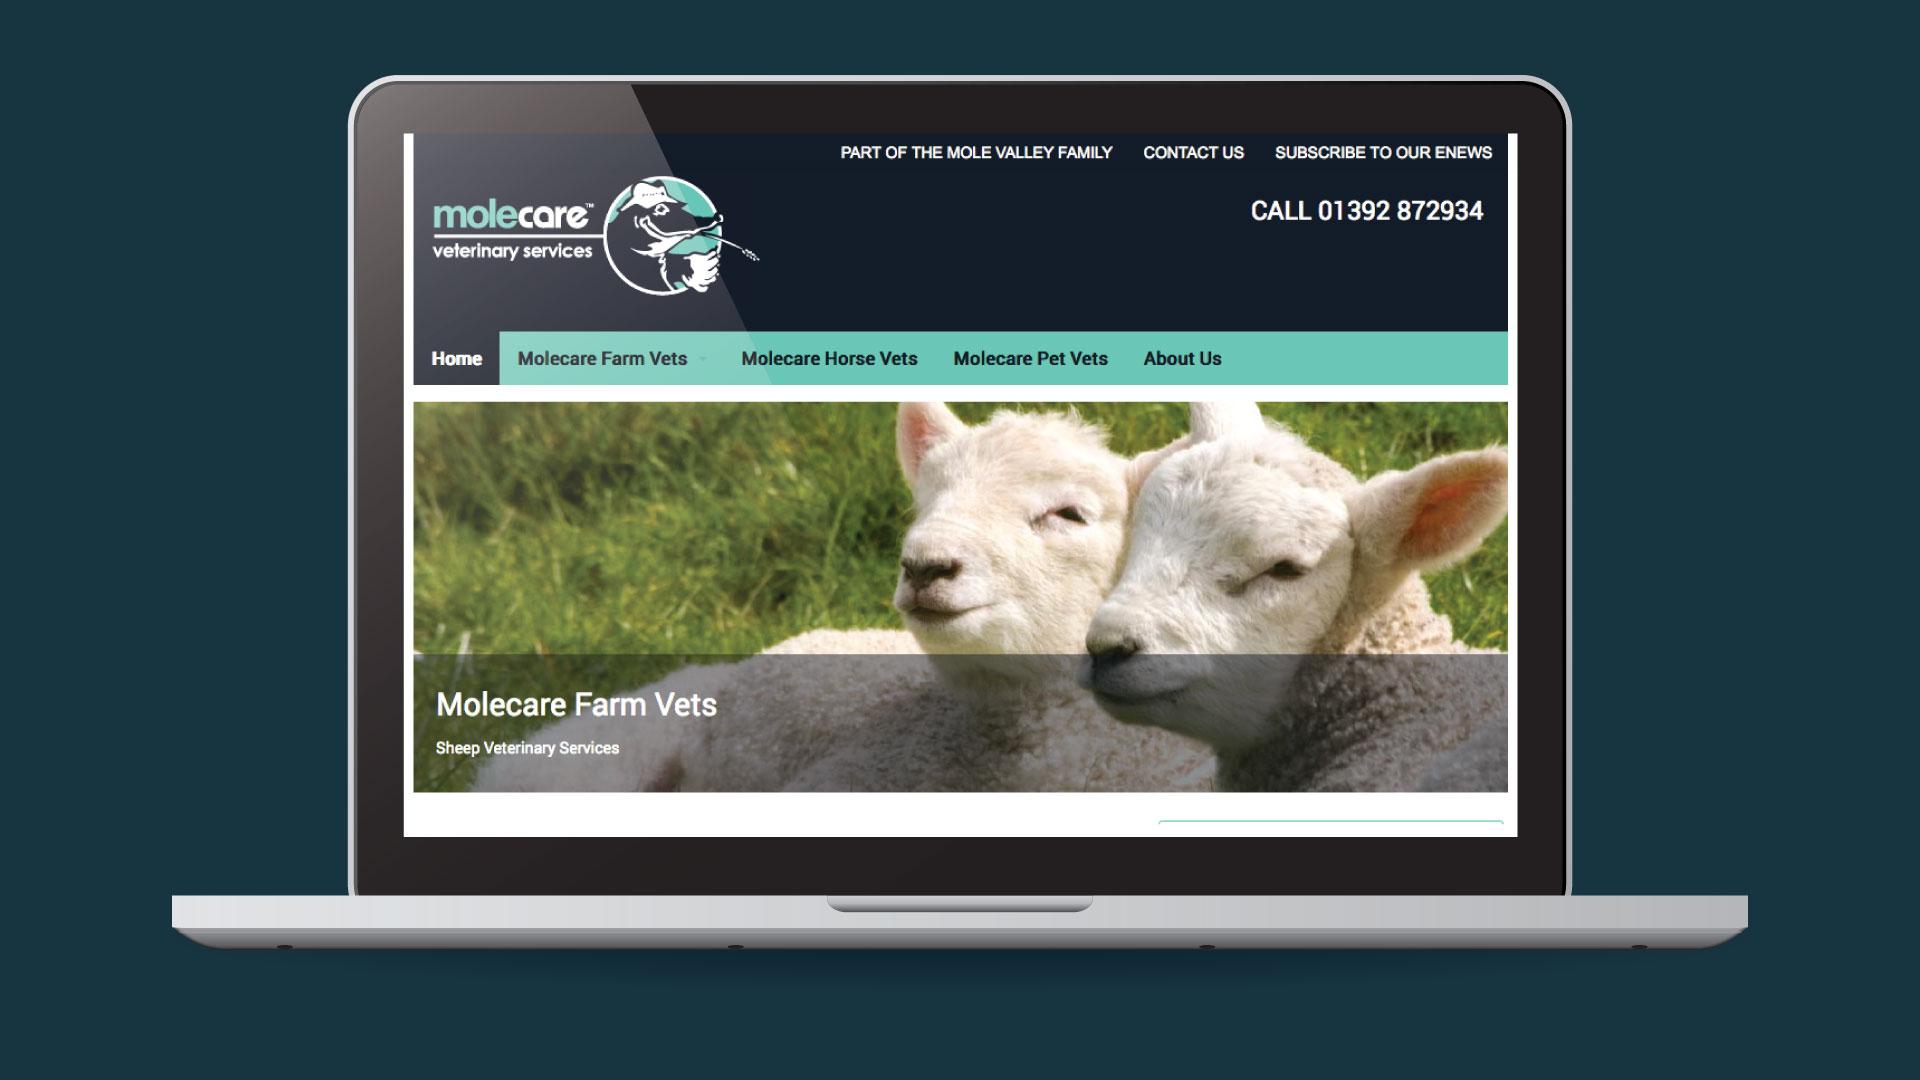 Molecare Vet Services Website Development in Devon